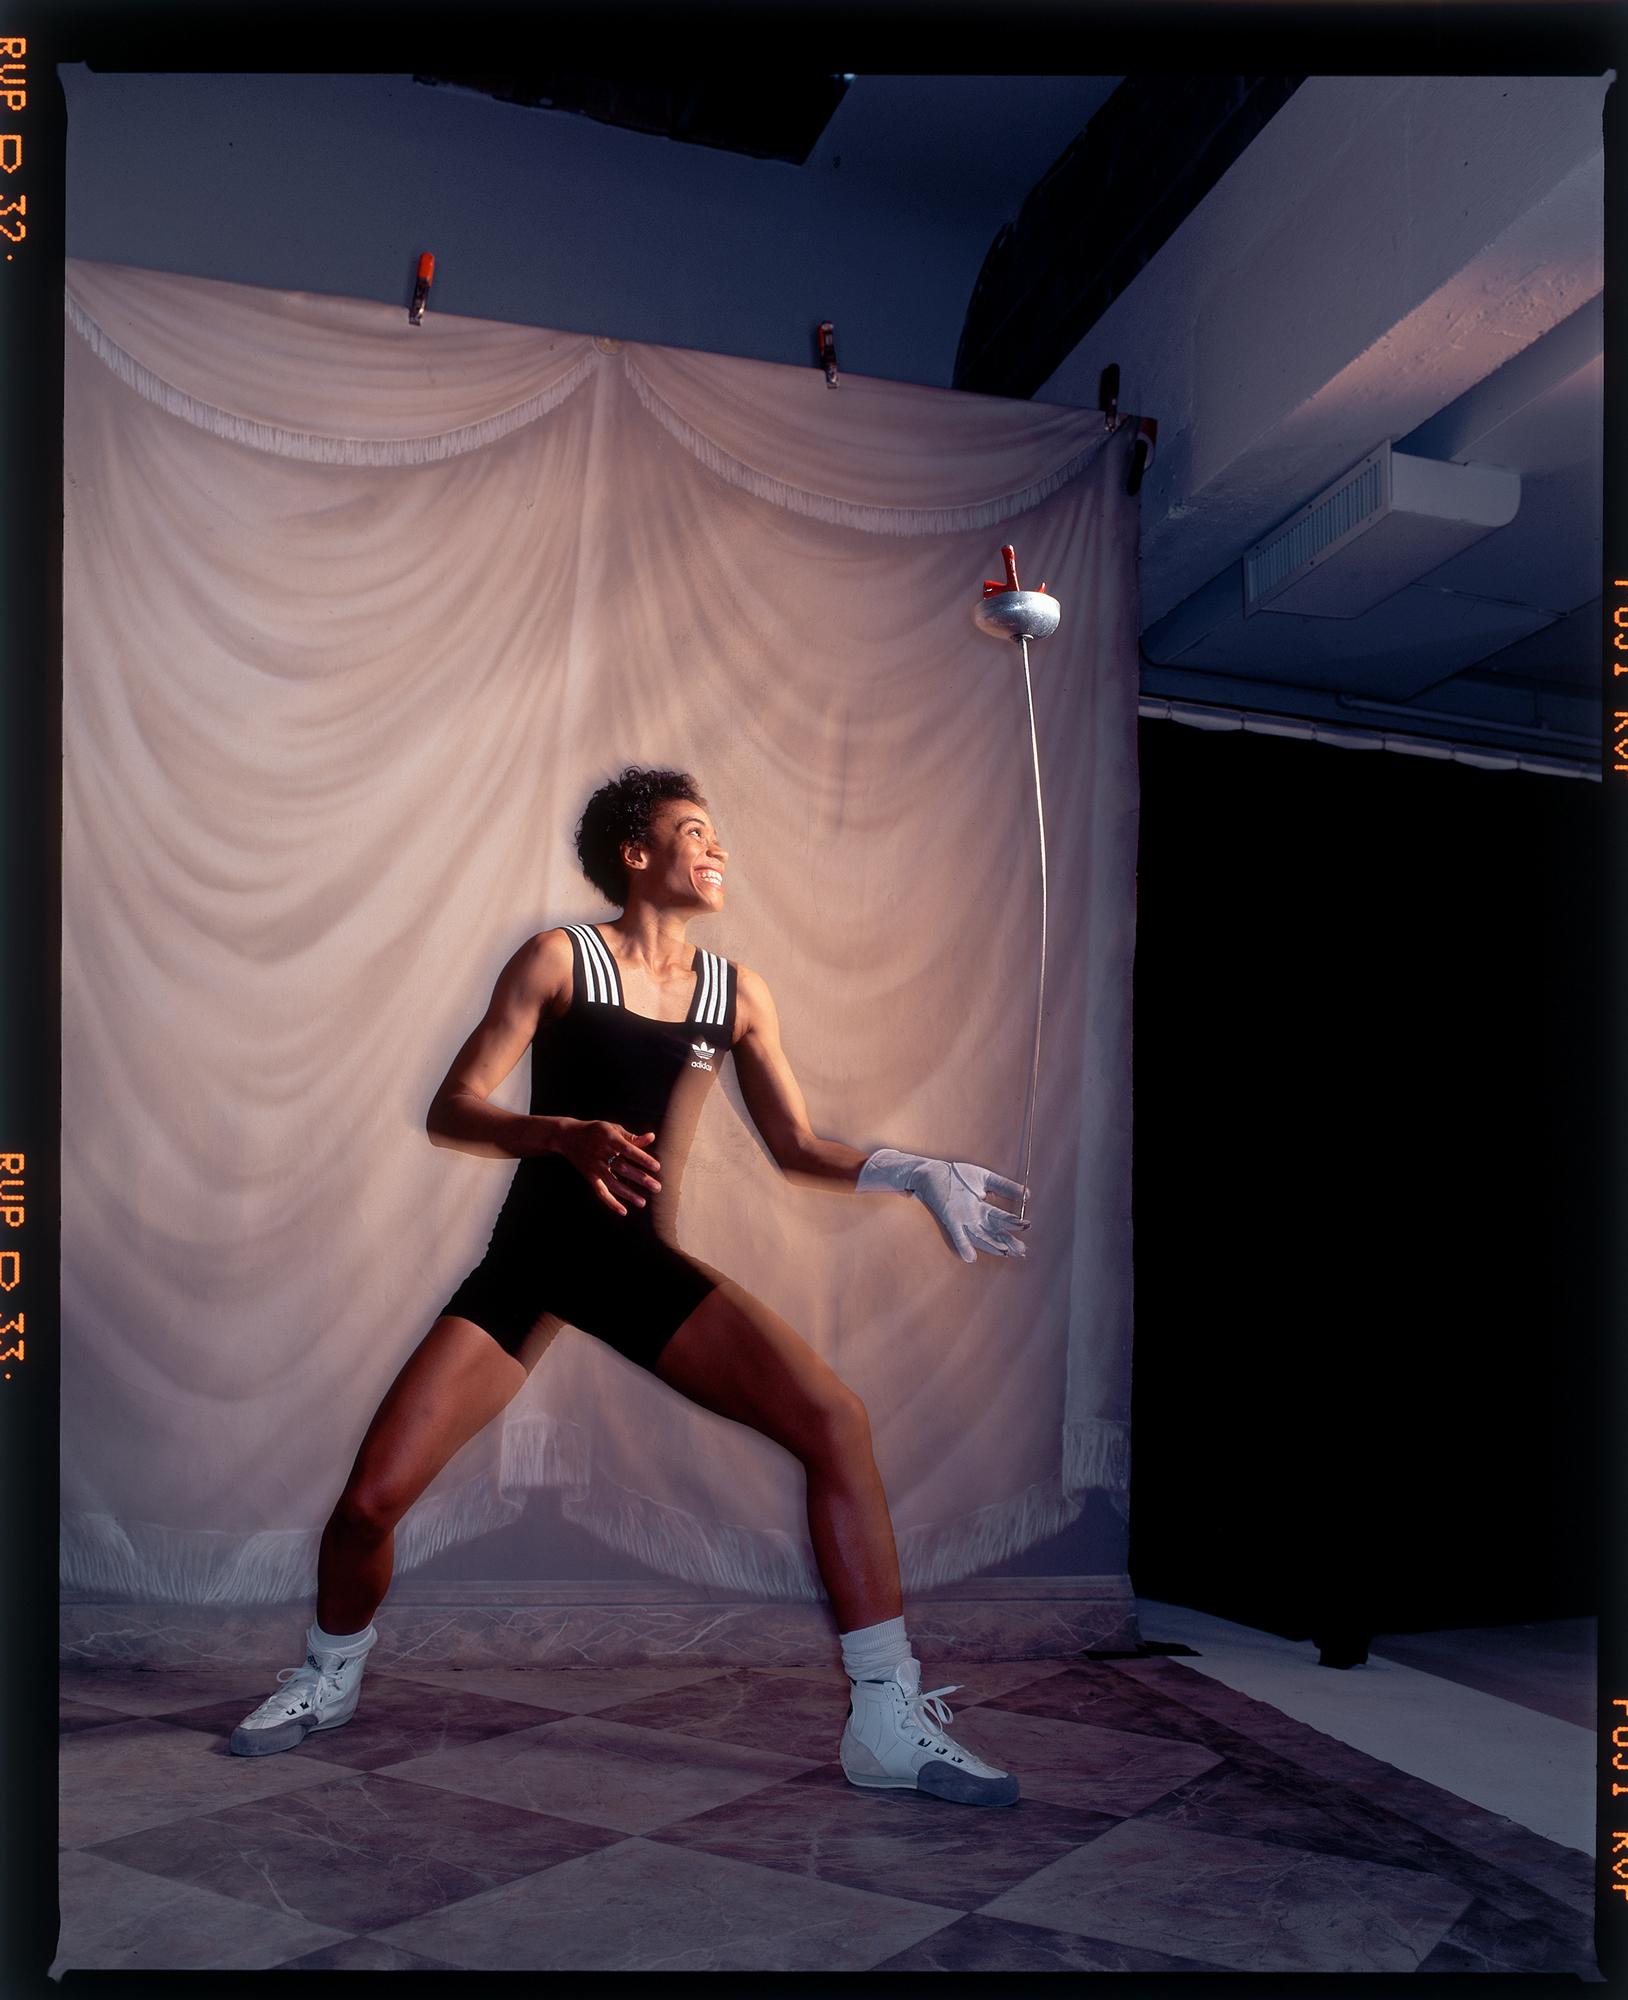 Sharon Mary Monplaisir, 1992